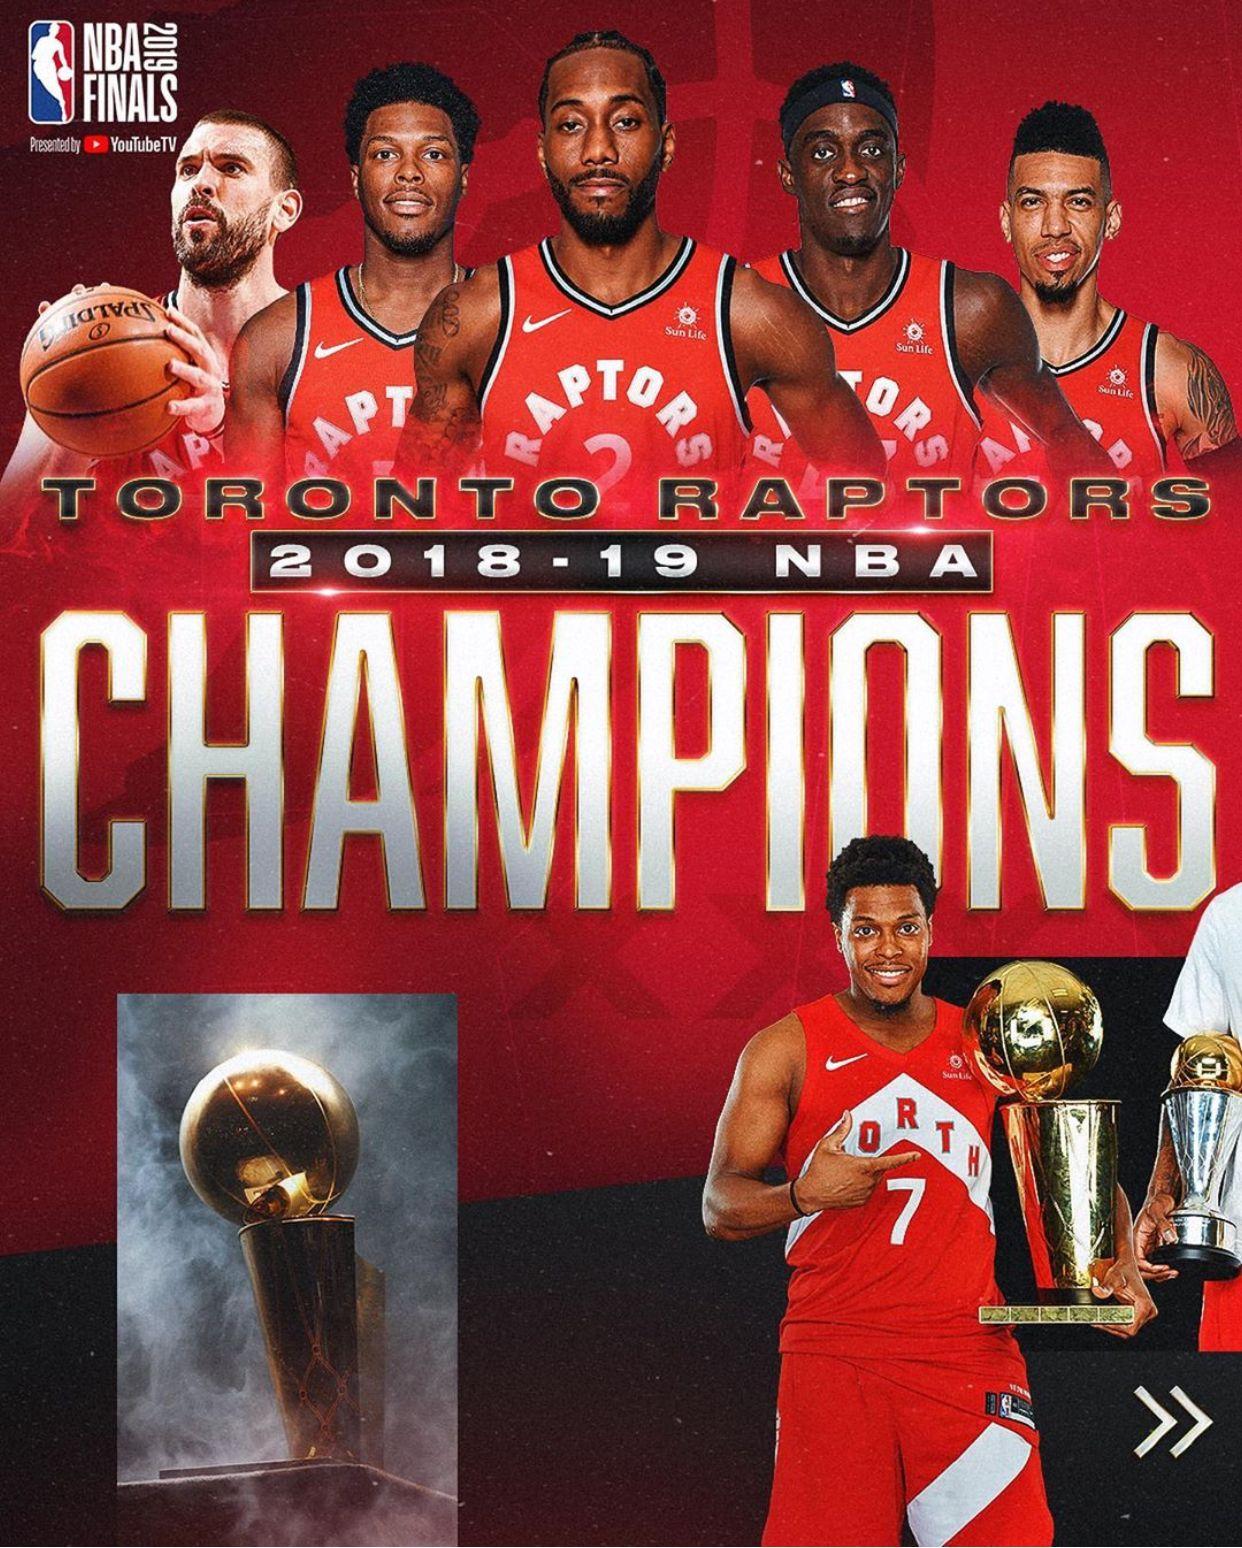 Pin By Www Peter Hooper Com On 6 Nba The Finals Nba Champions Toronto Raptors Basketball Raptors